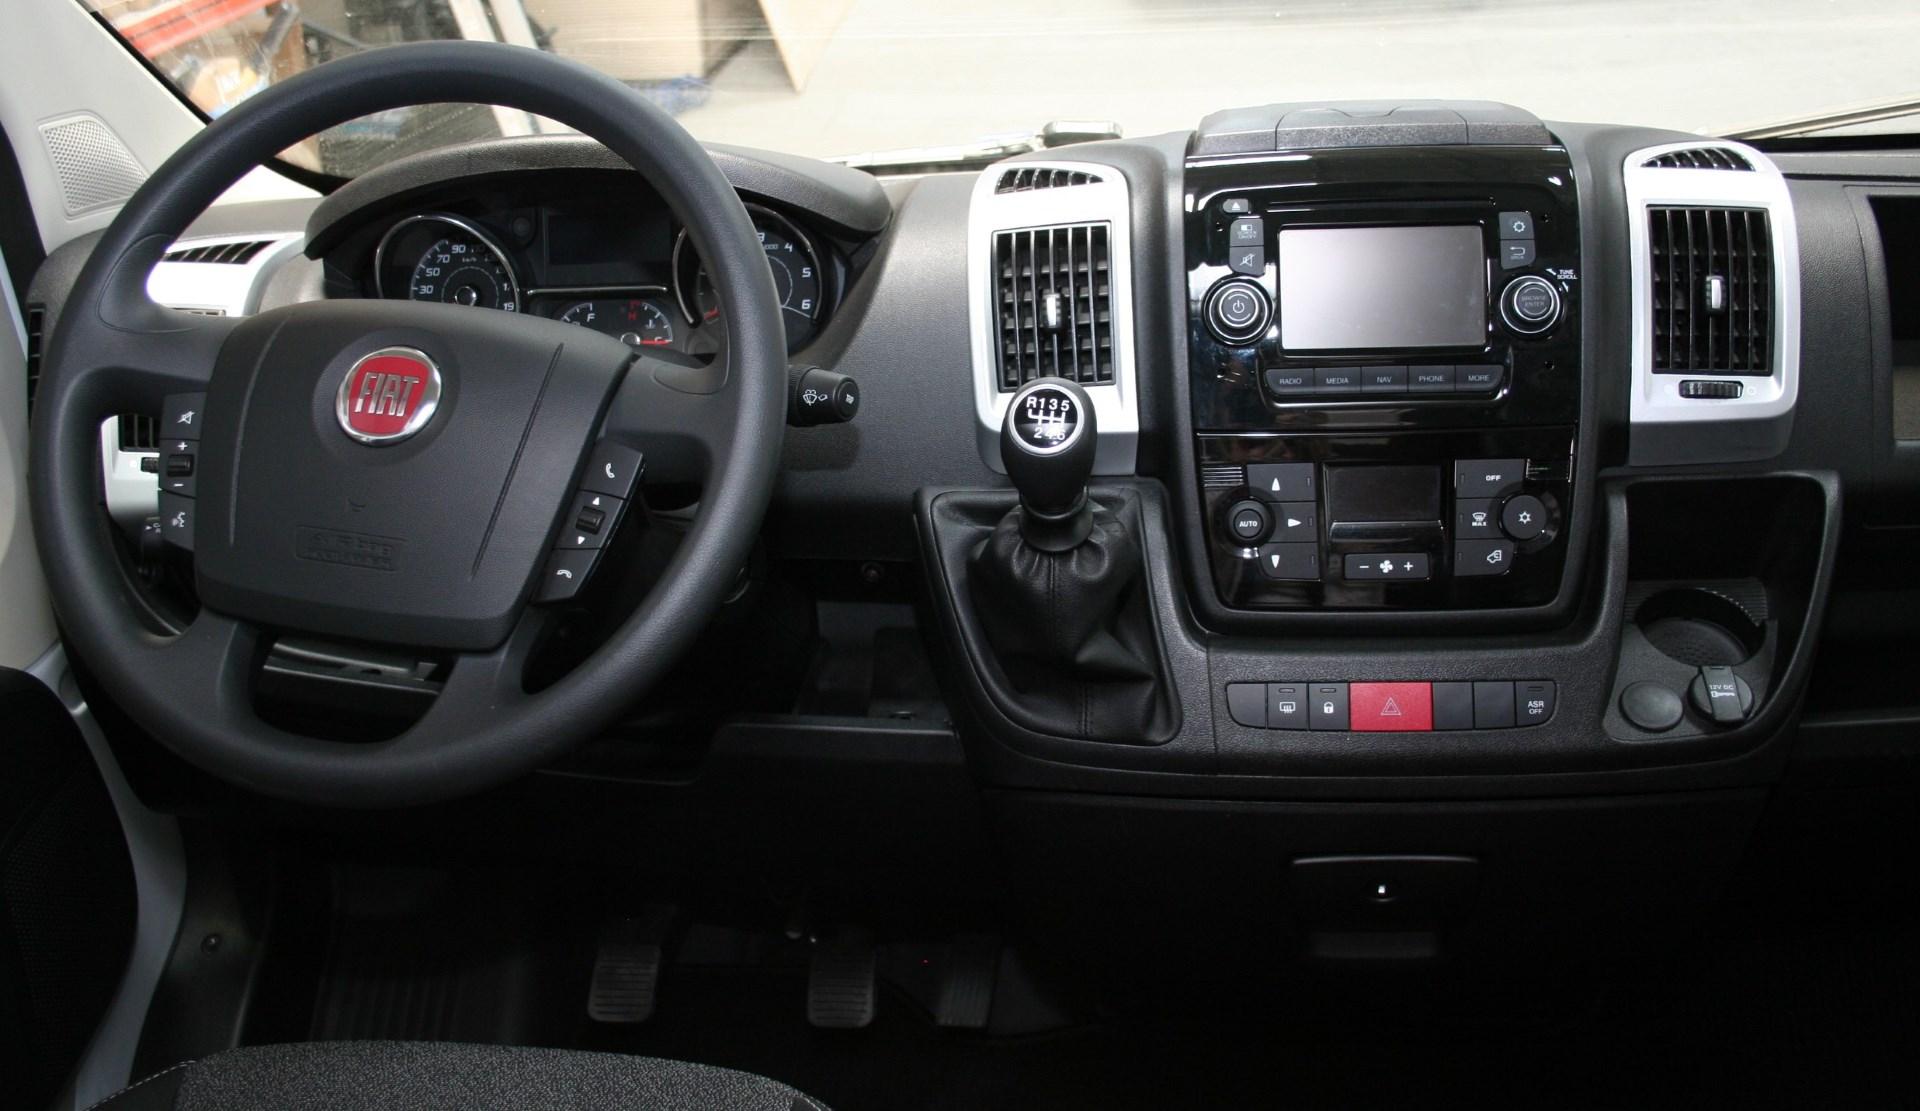 Family S L2H2 Fiat Ducato Bunkervan (25)